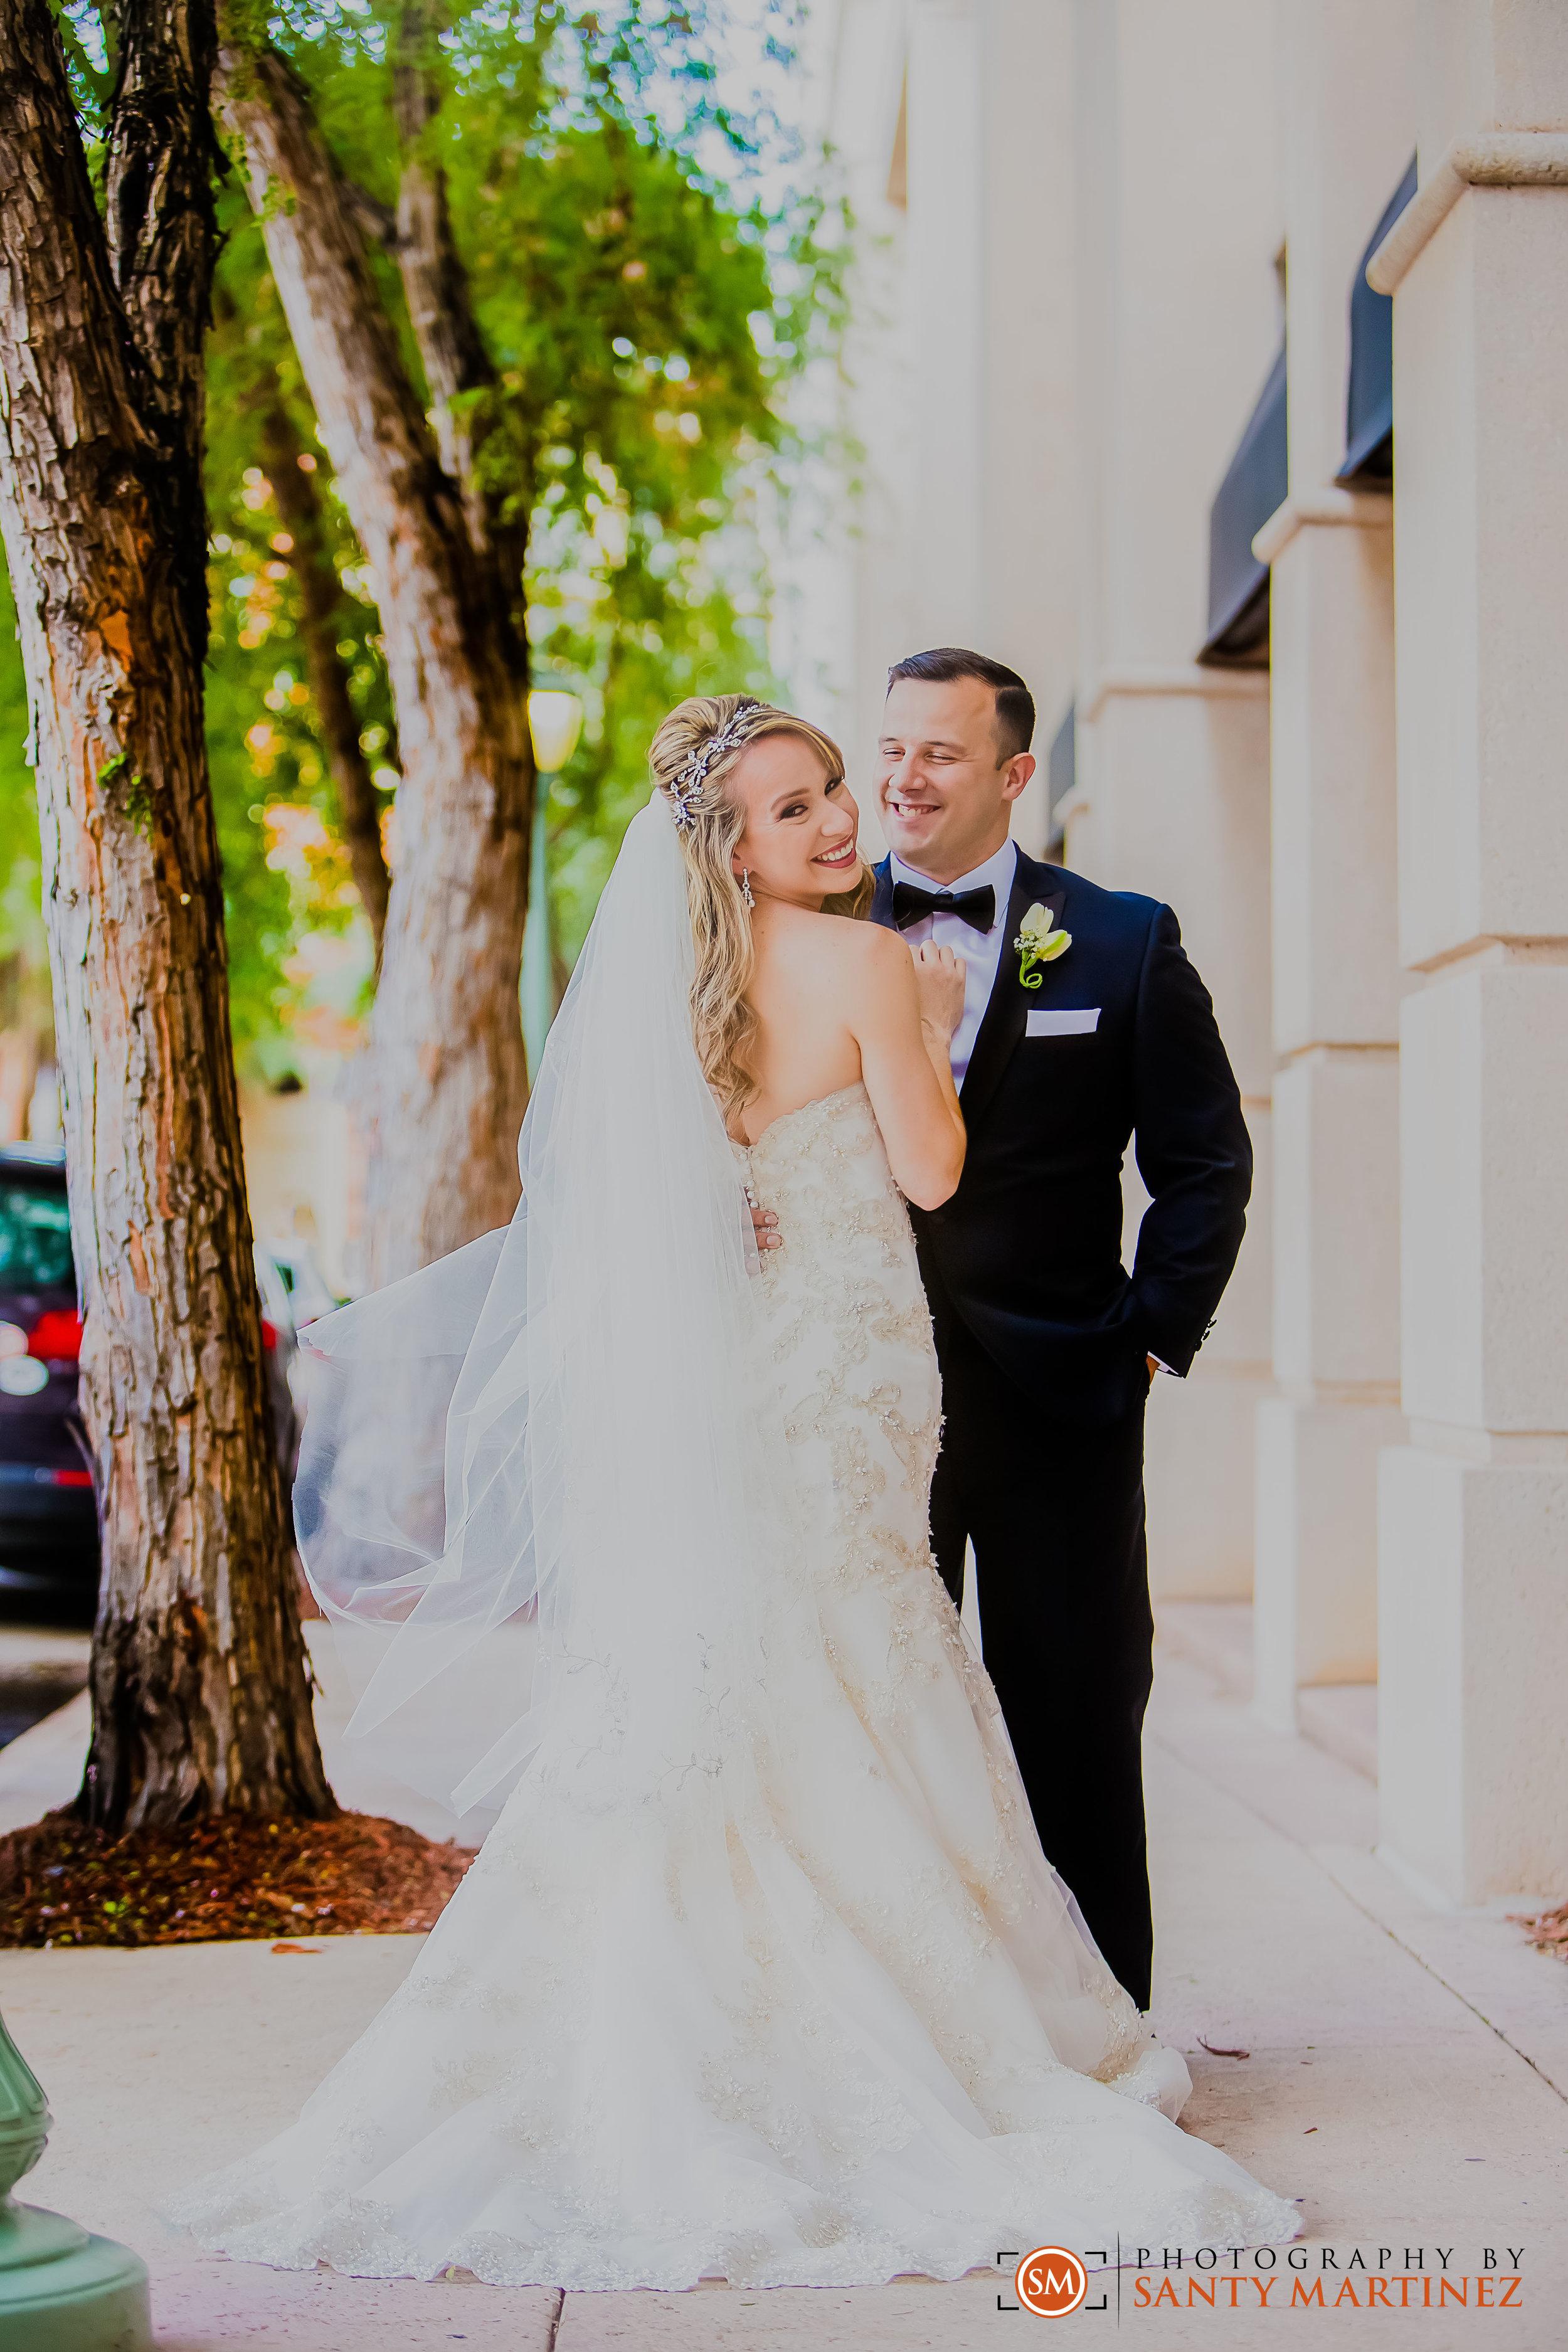 Wedding La Jolla Ballroom - Photography by Santy Martinez-23.jpg